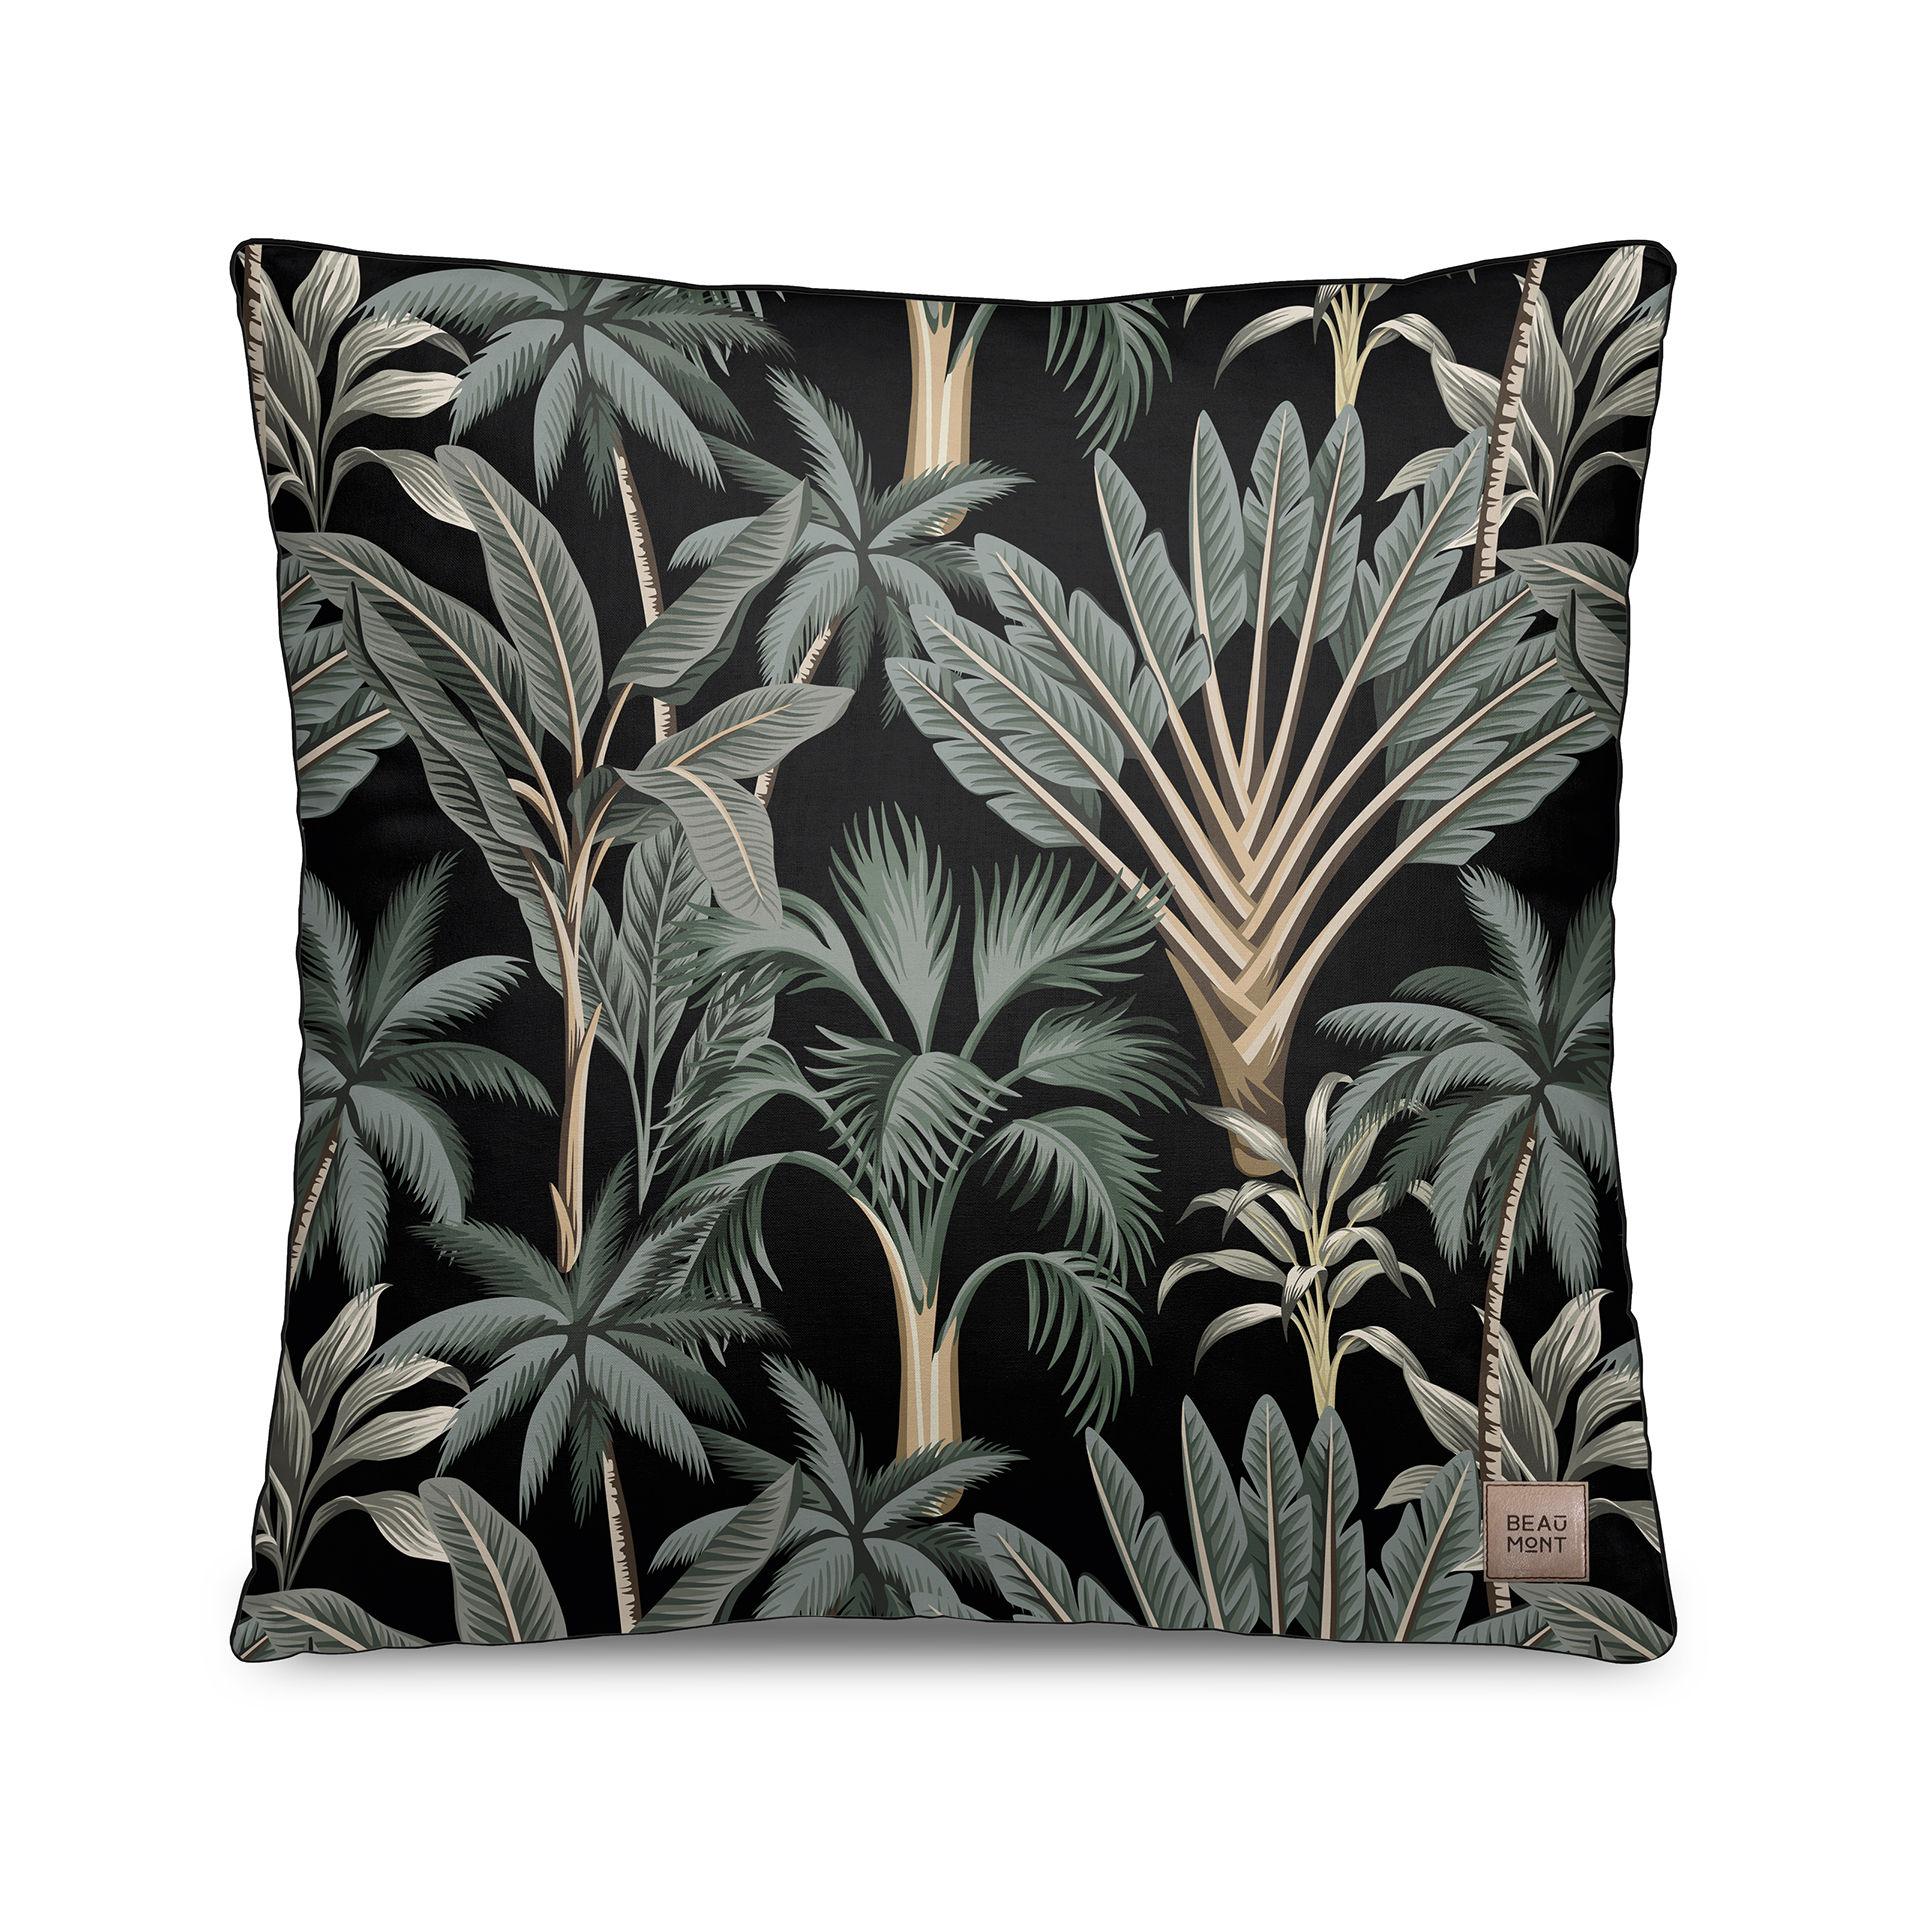 Decoration - Cushions & Poufs - Tresors Cushion - / Velvet - 45 x 45 cm by Beaumont - Palmiers No. 3 / Black & green - Polyester, Velvet